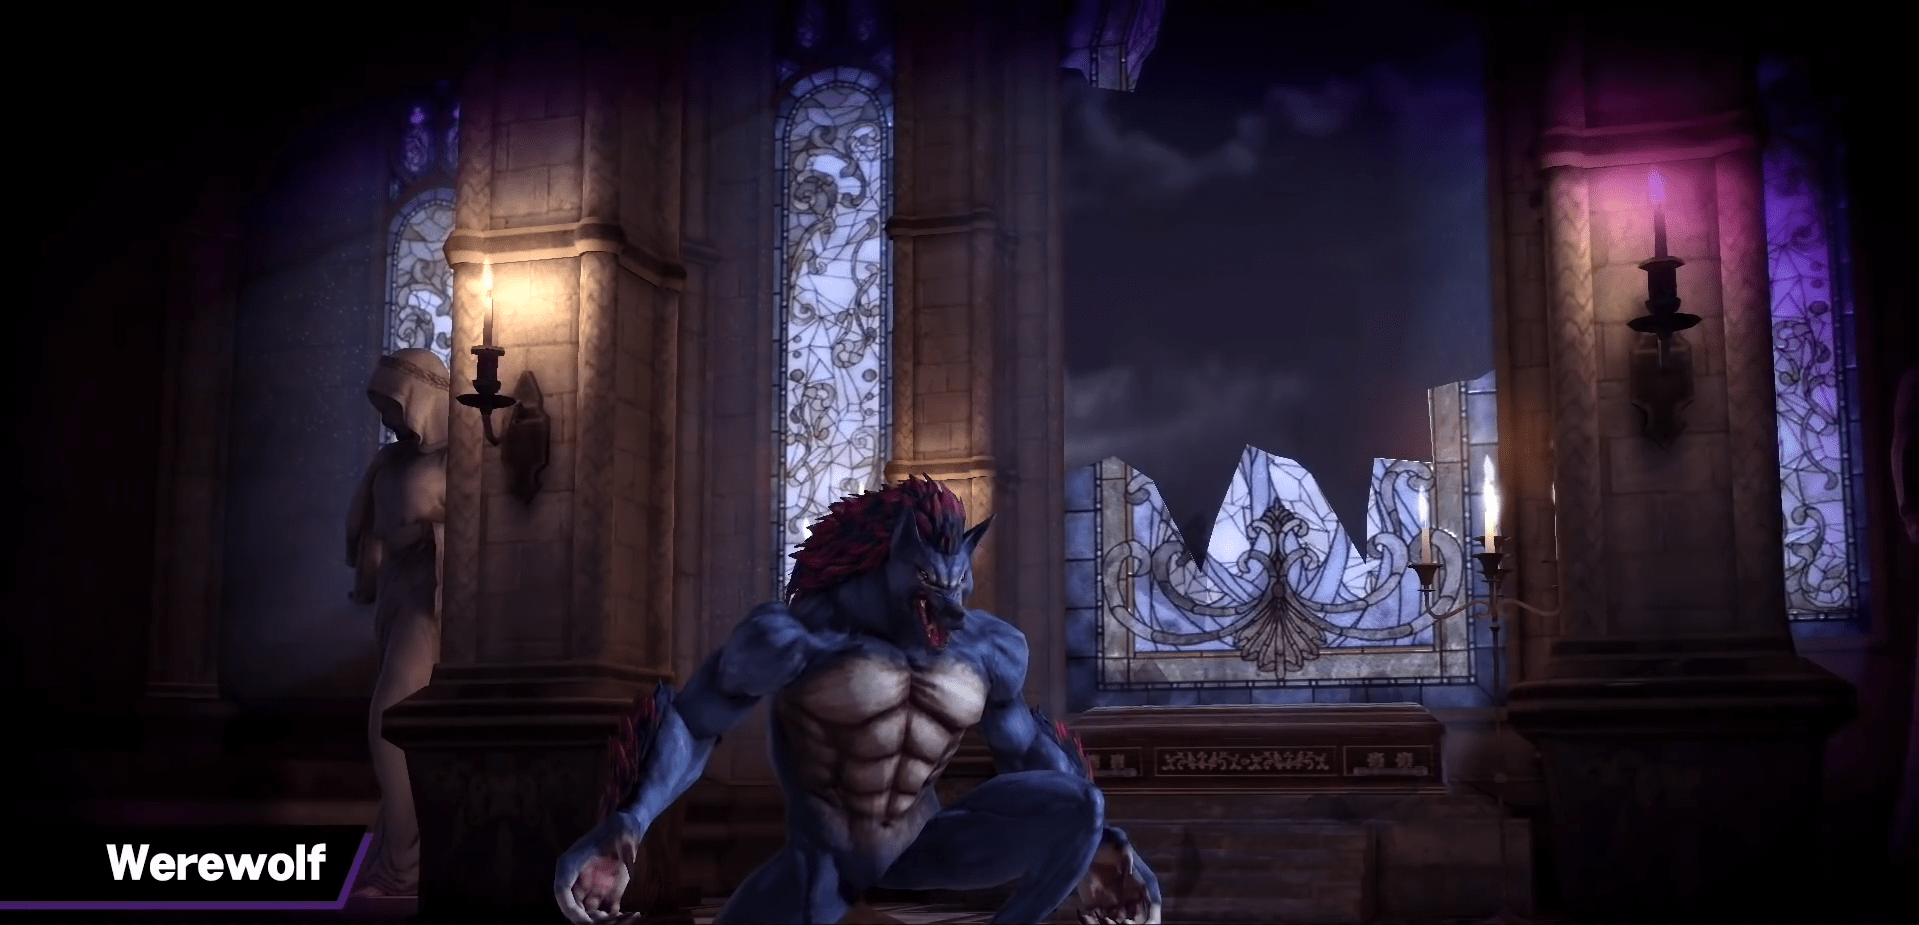 Super Smash Bros ultimate nintendo direct imagen 9